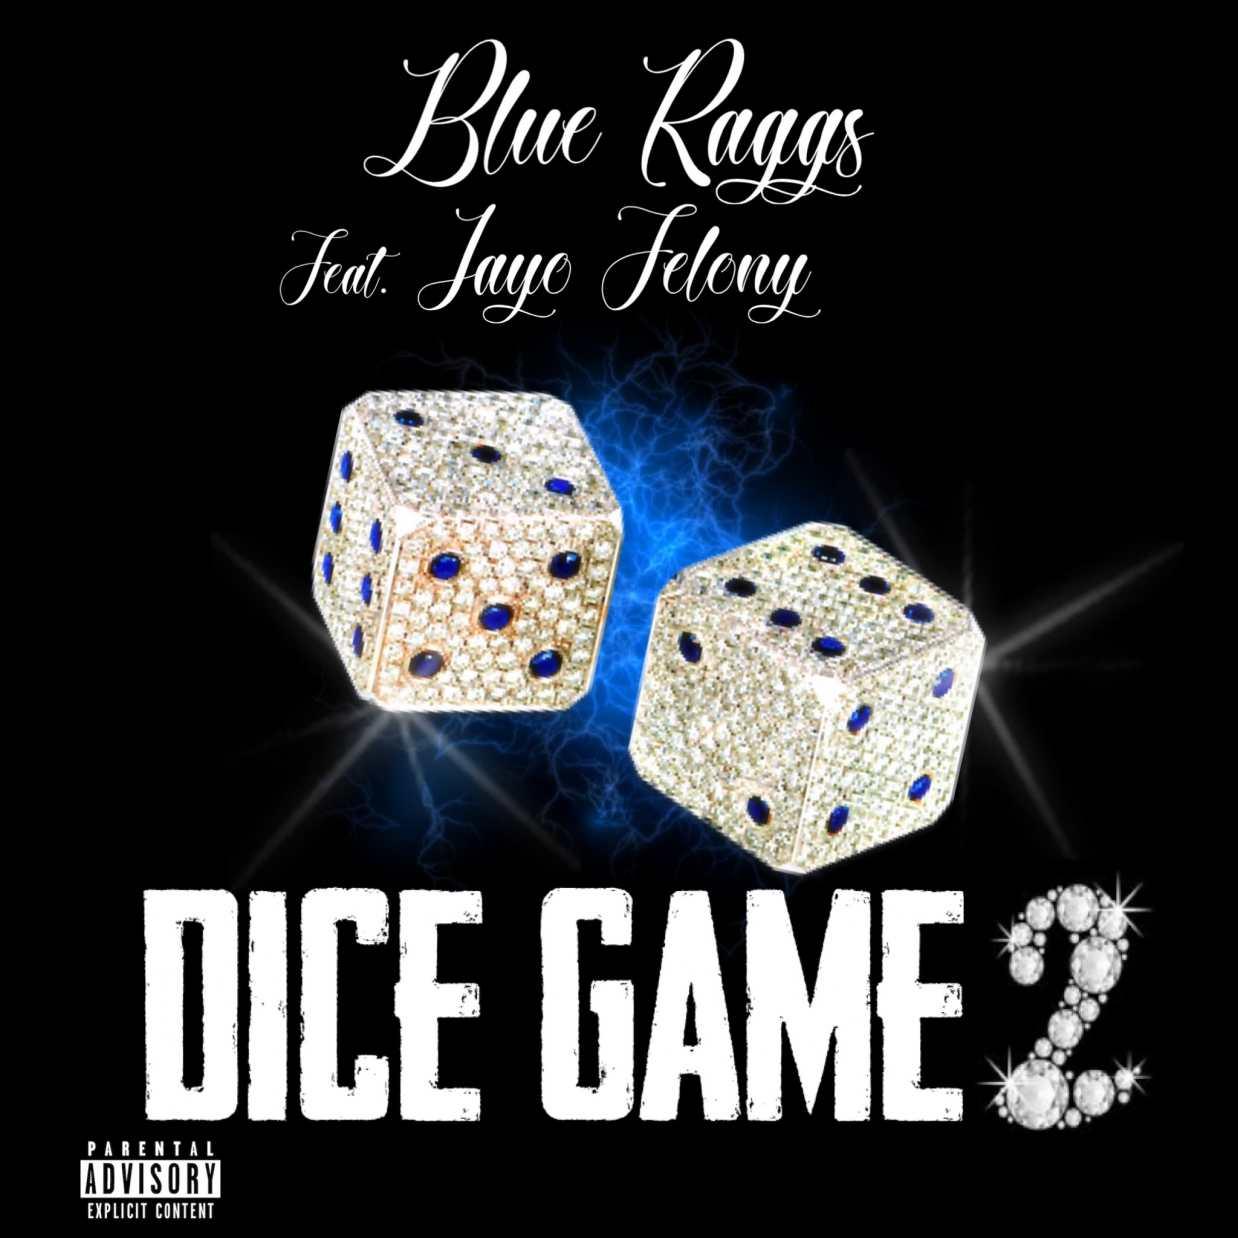 Dice Game Pt. 2 ft. Jayo Felony